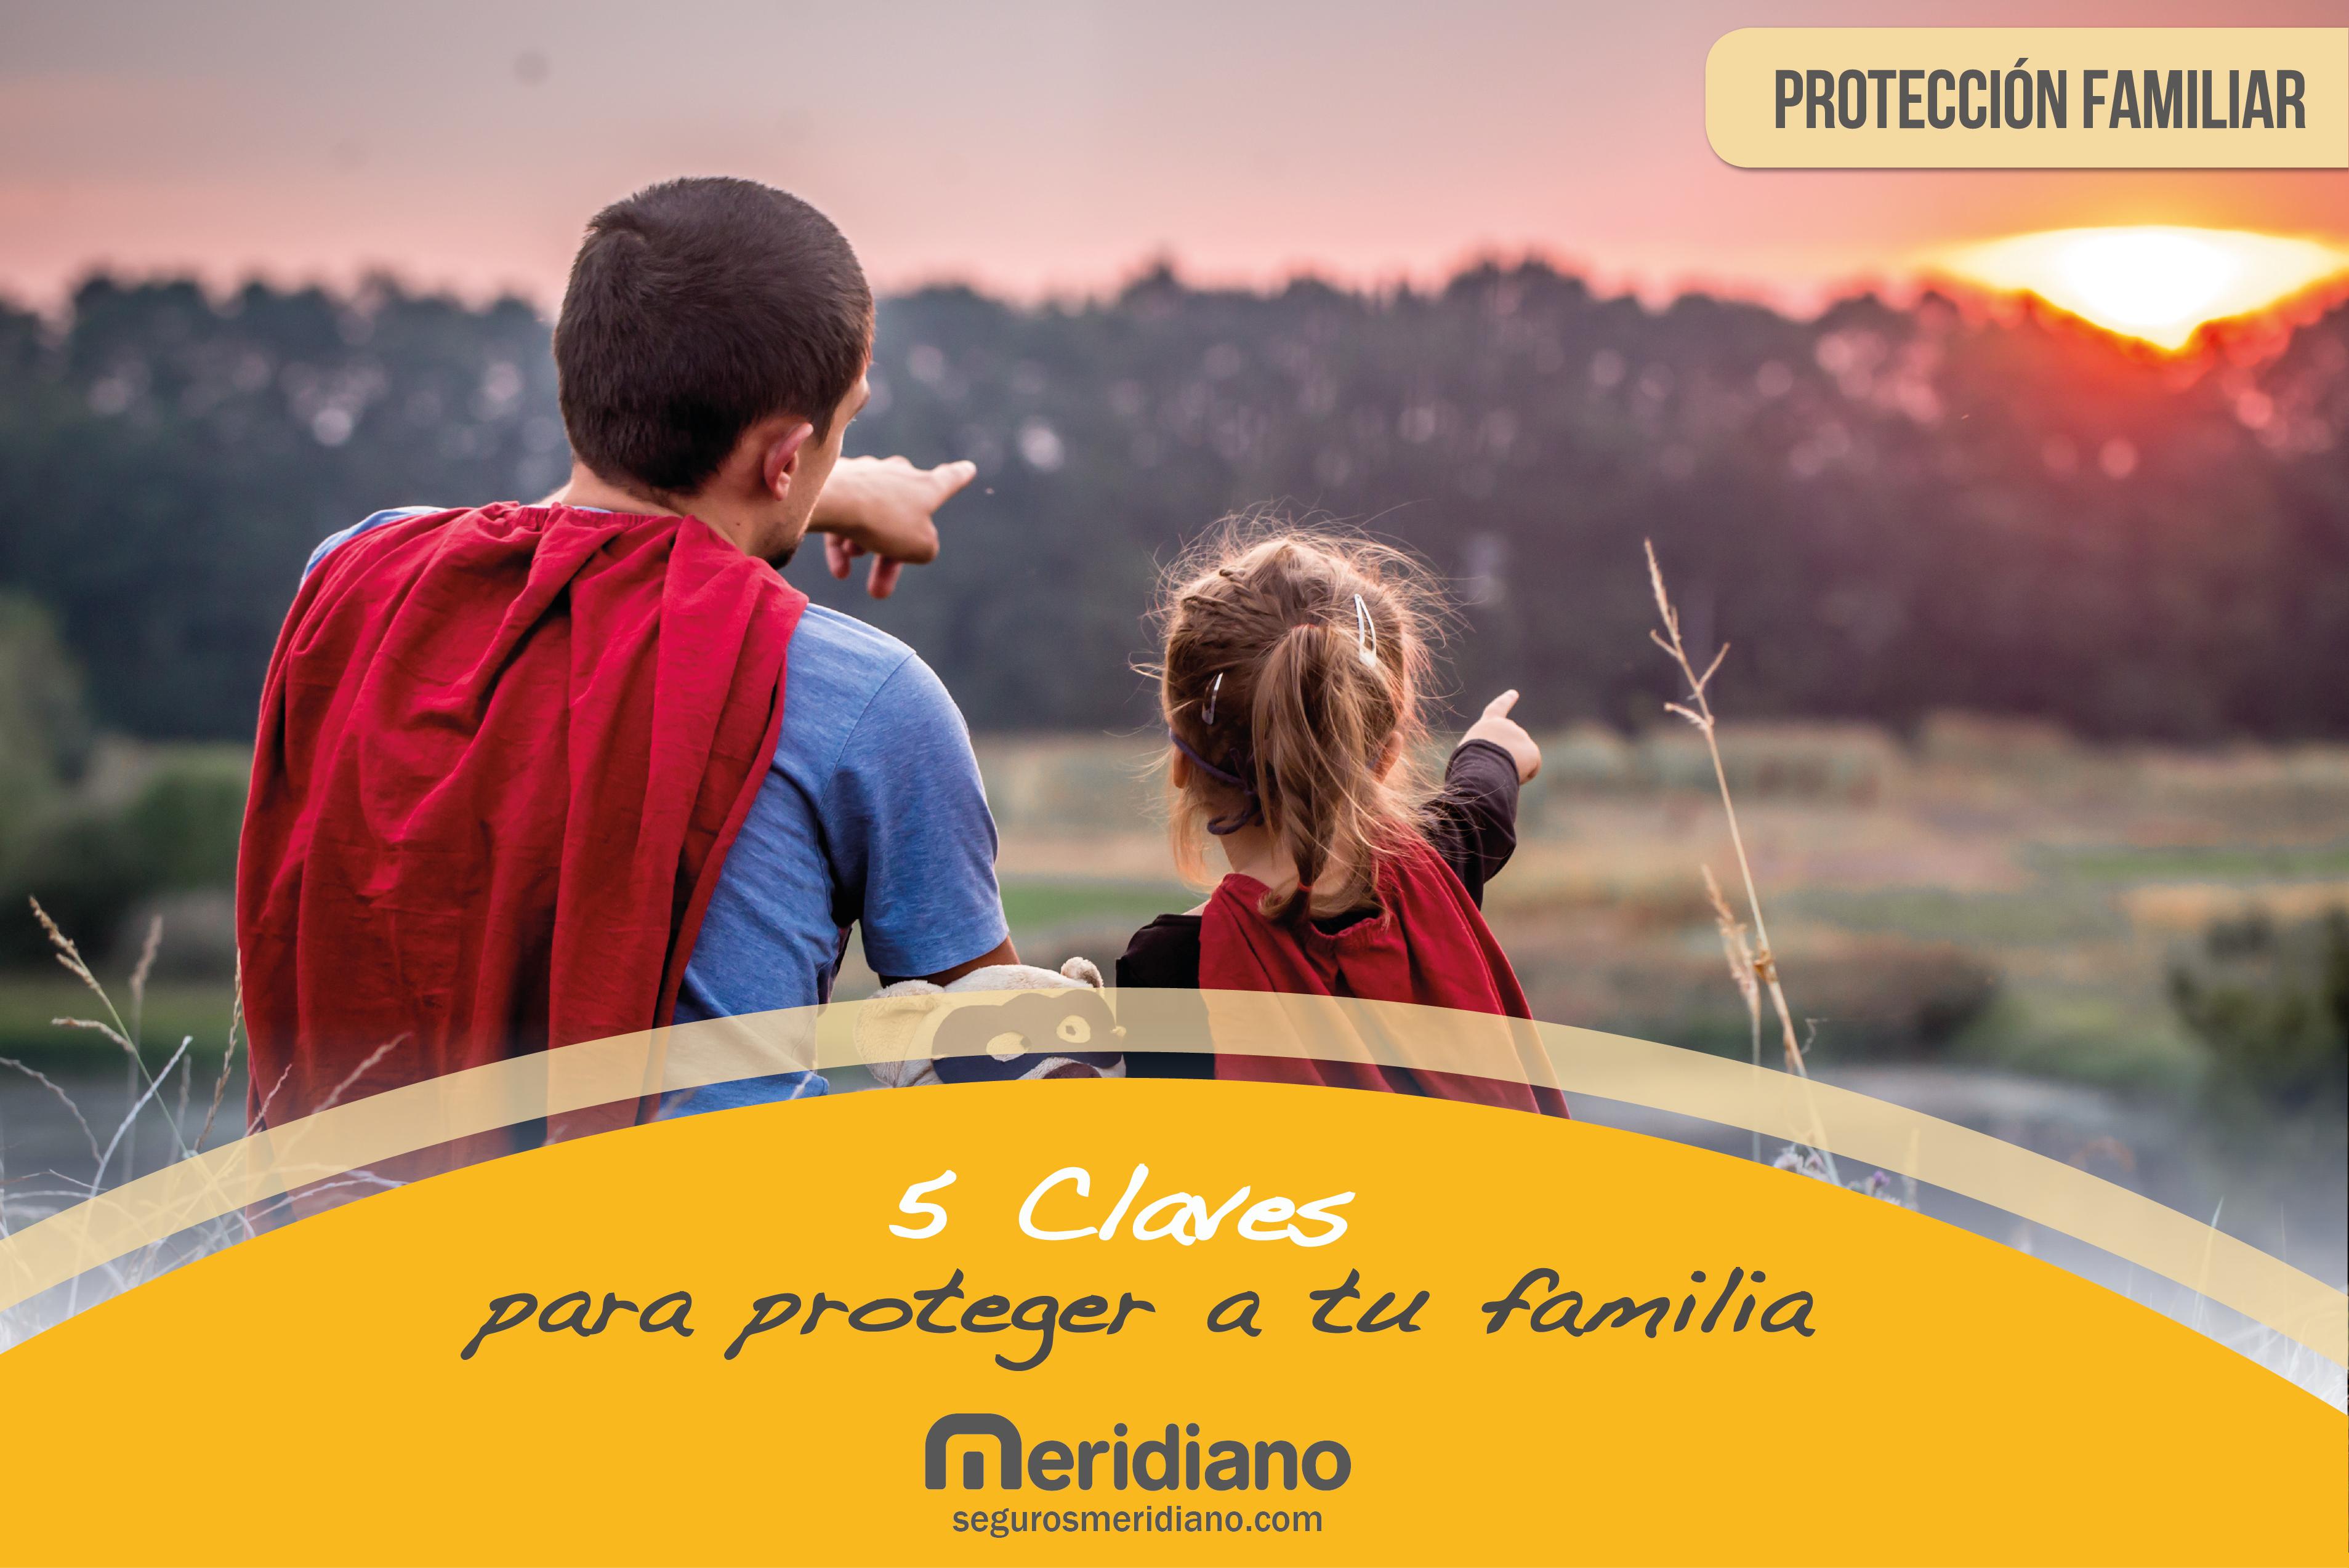 5 claves para proteger a tu familia